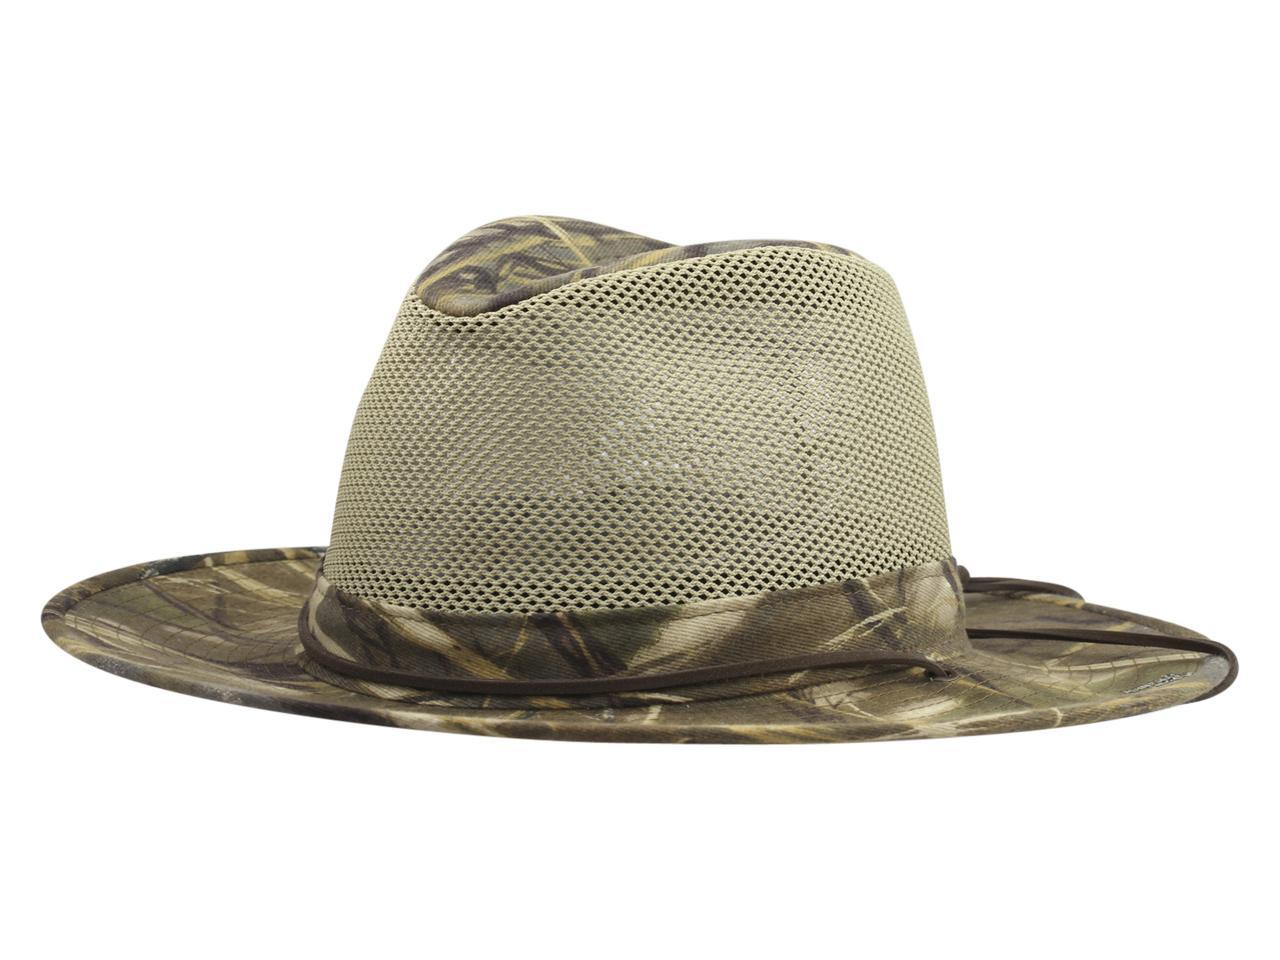 Henschel Men s Realtree Aussie Camo Breezer Safari Hat 6d5c1b79fe9f